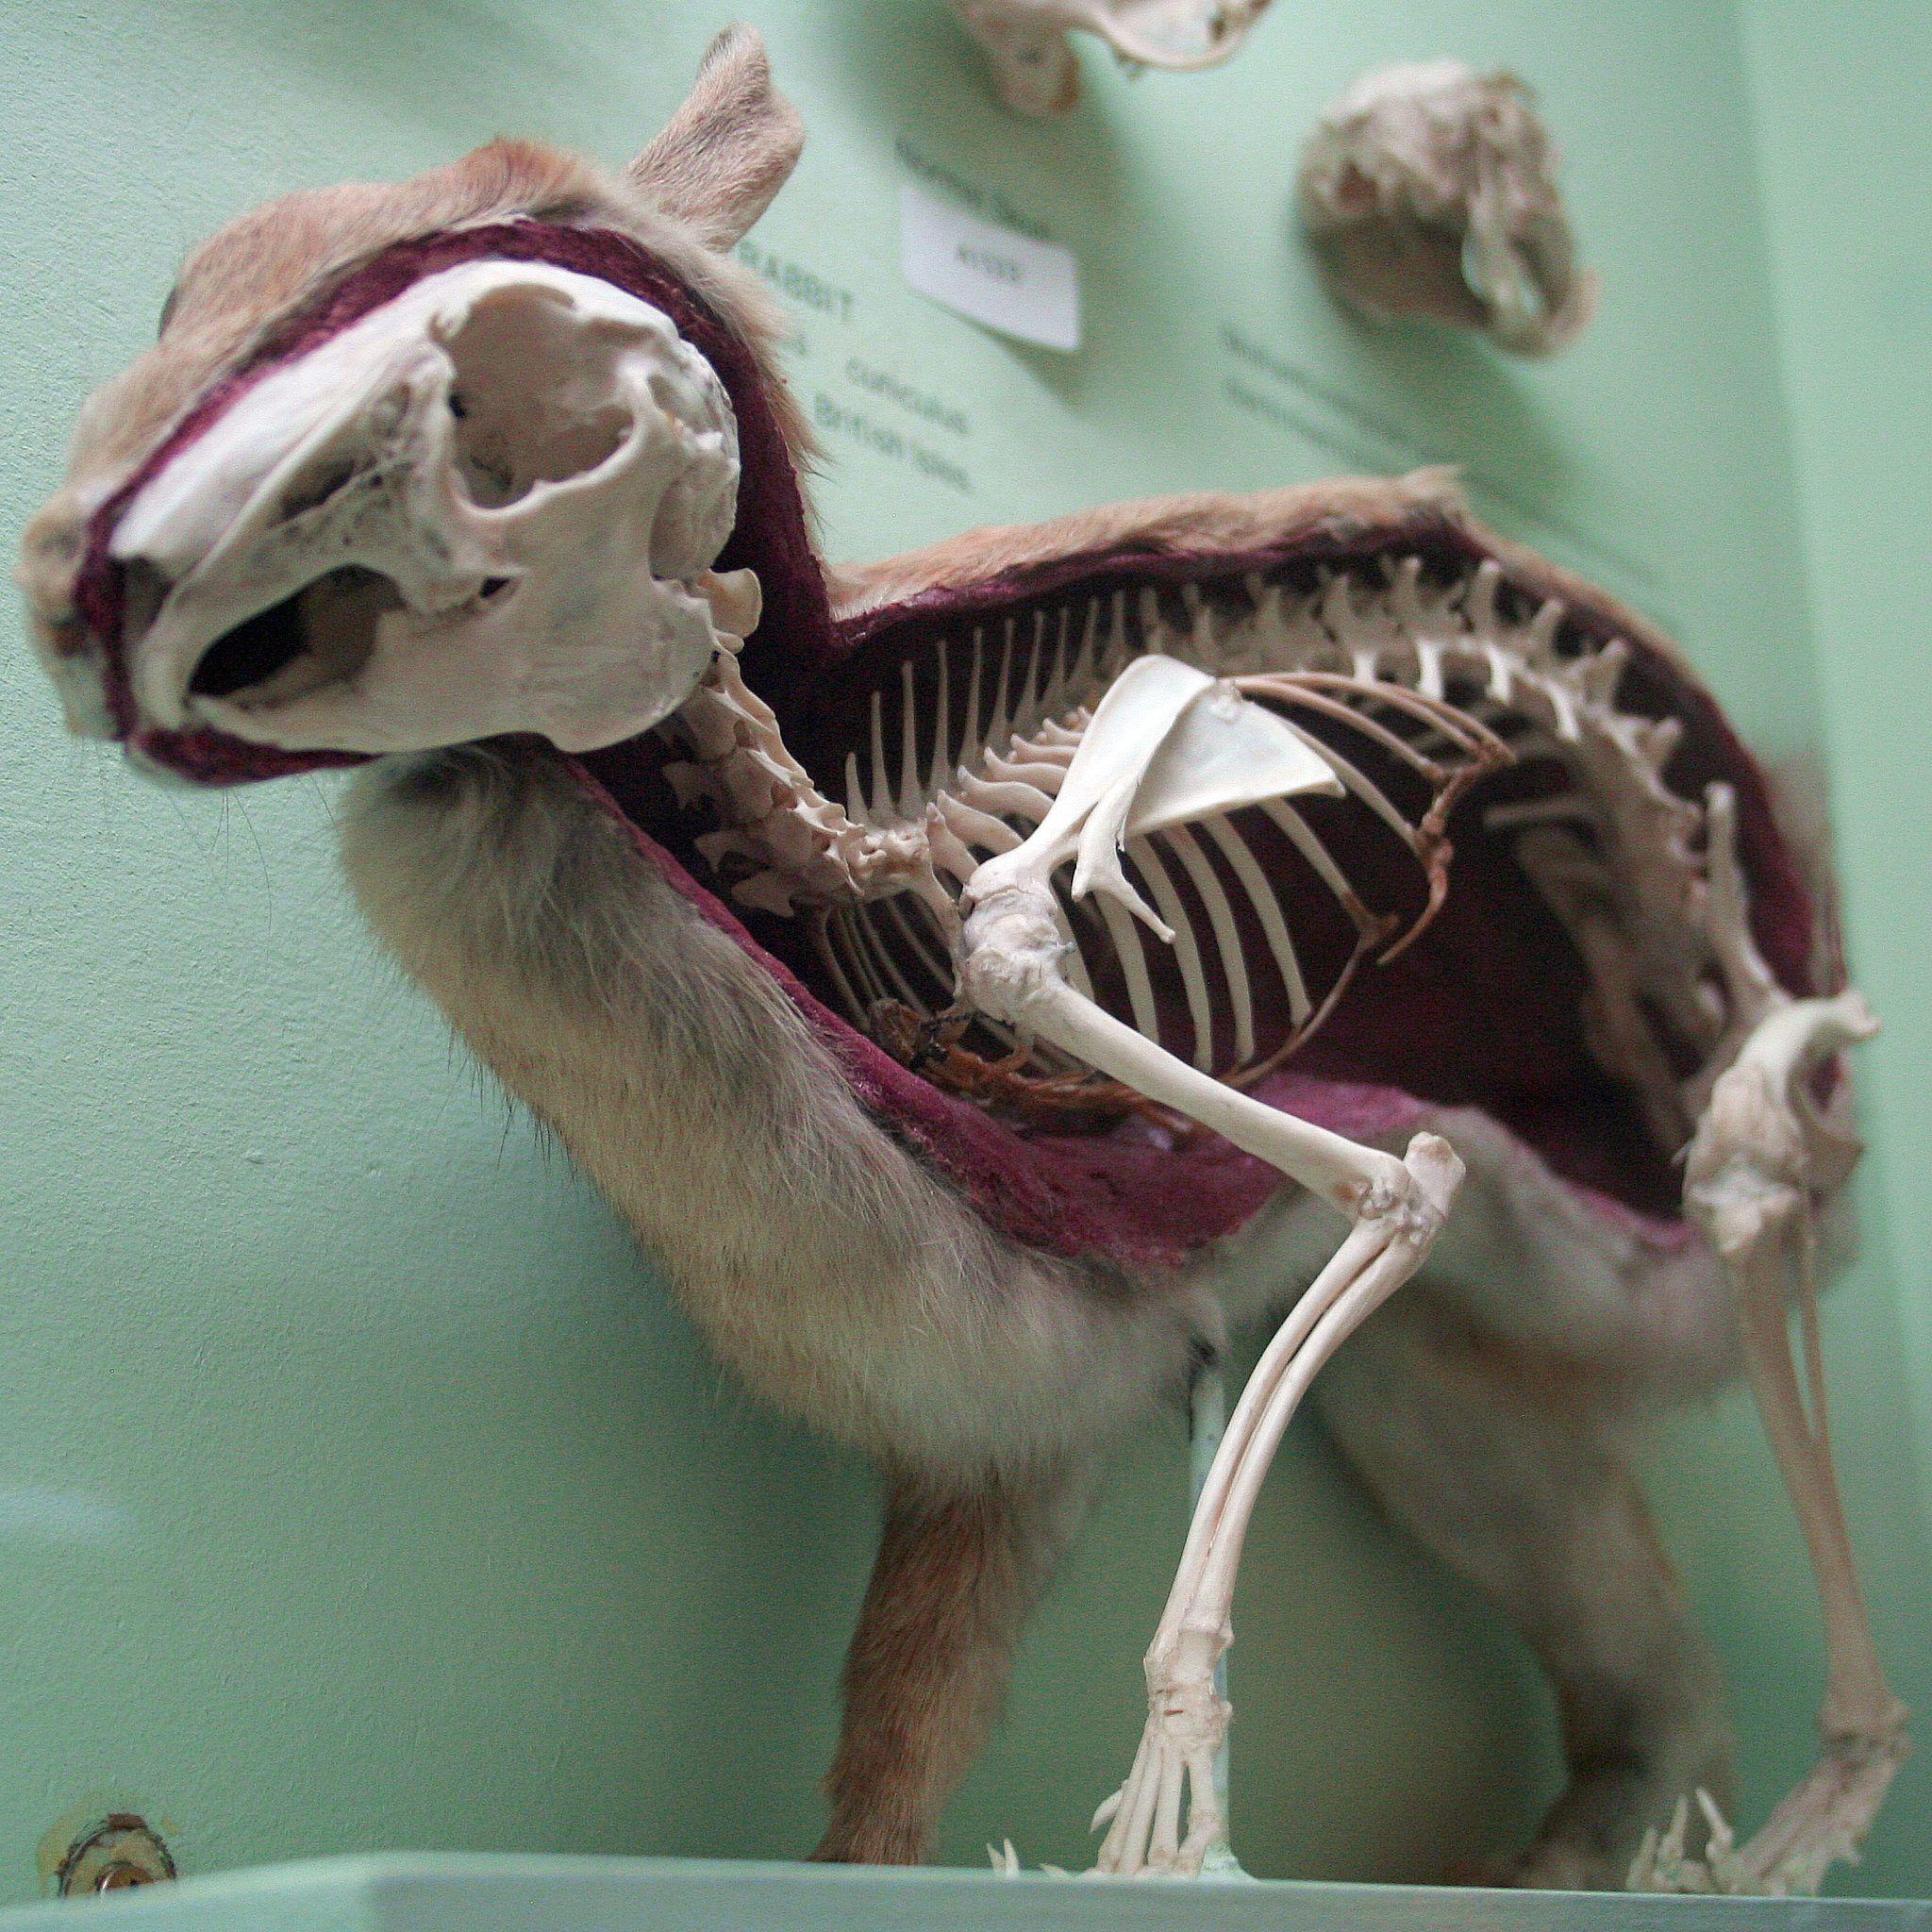 Rabbit - Wikipedia, the free encyclopedia | Skullatons | Pinterest ...